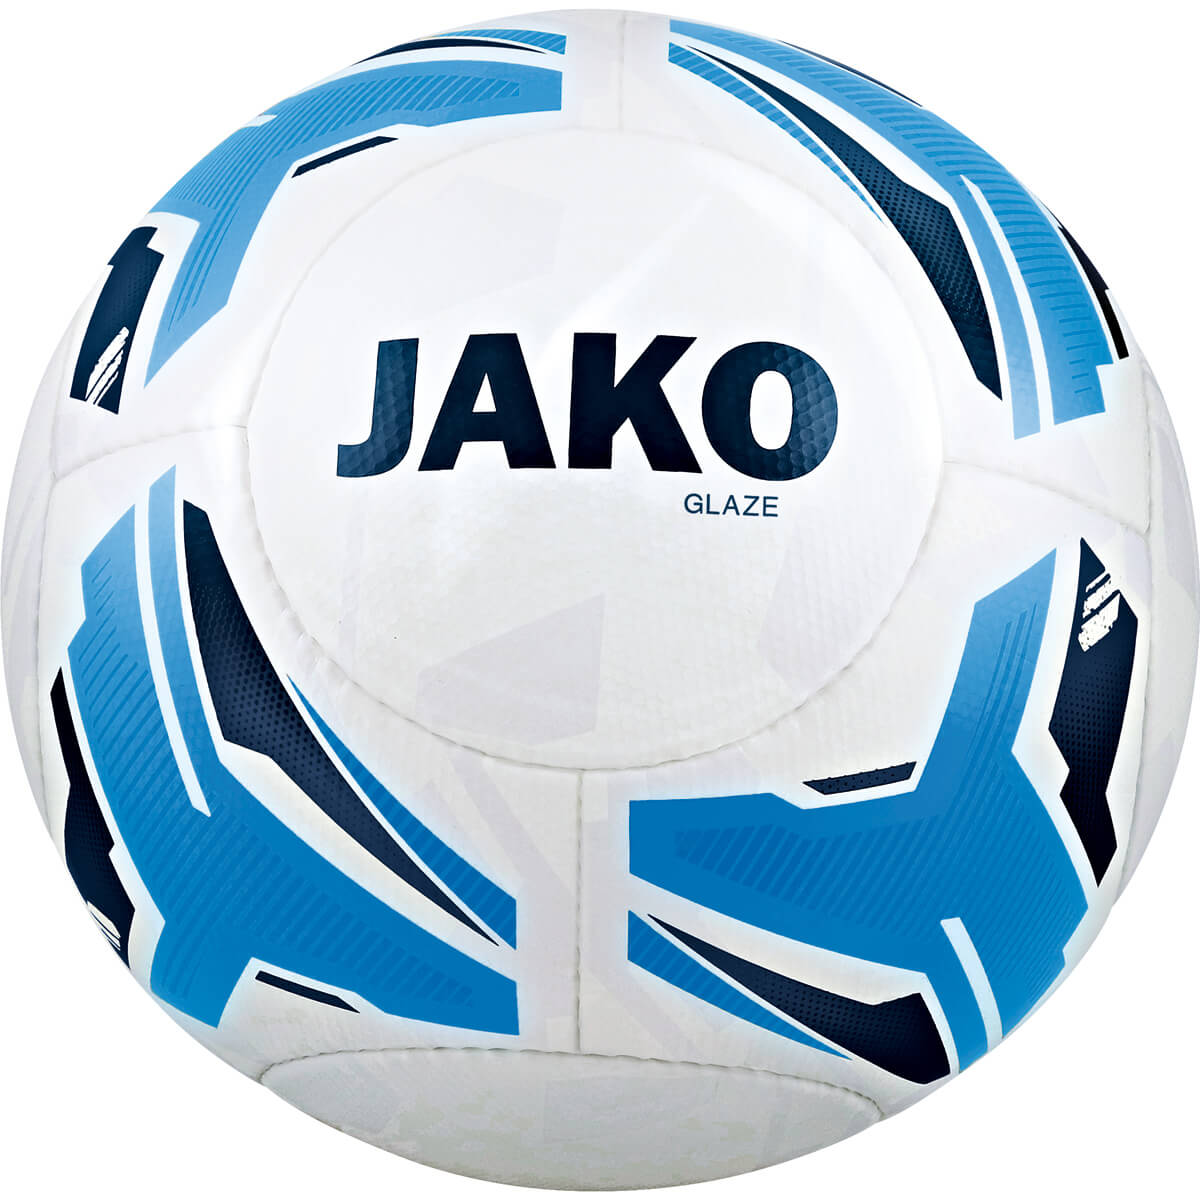 Jako Trainingsball Glaze  2369  | div. Größen / Farben